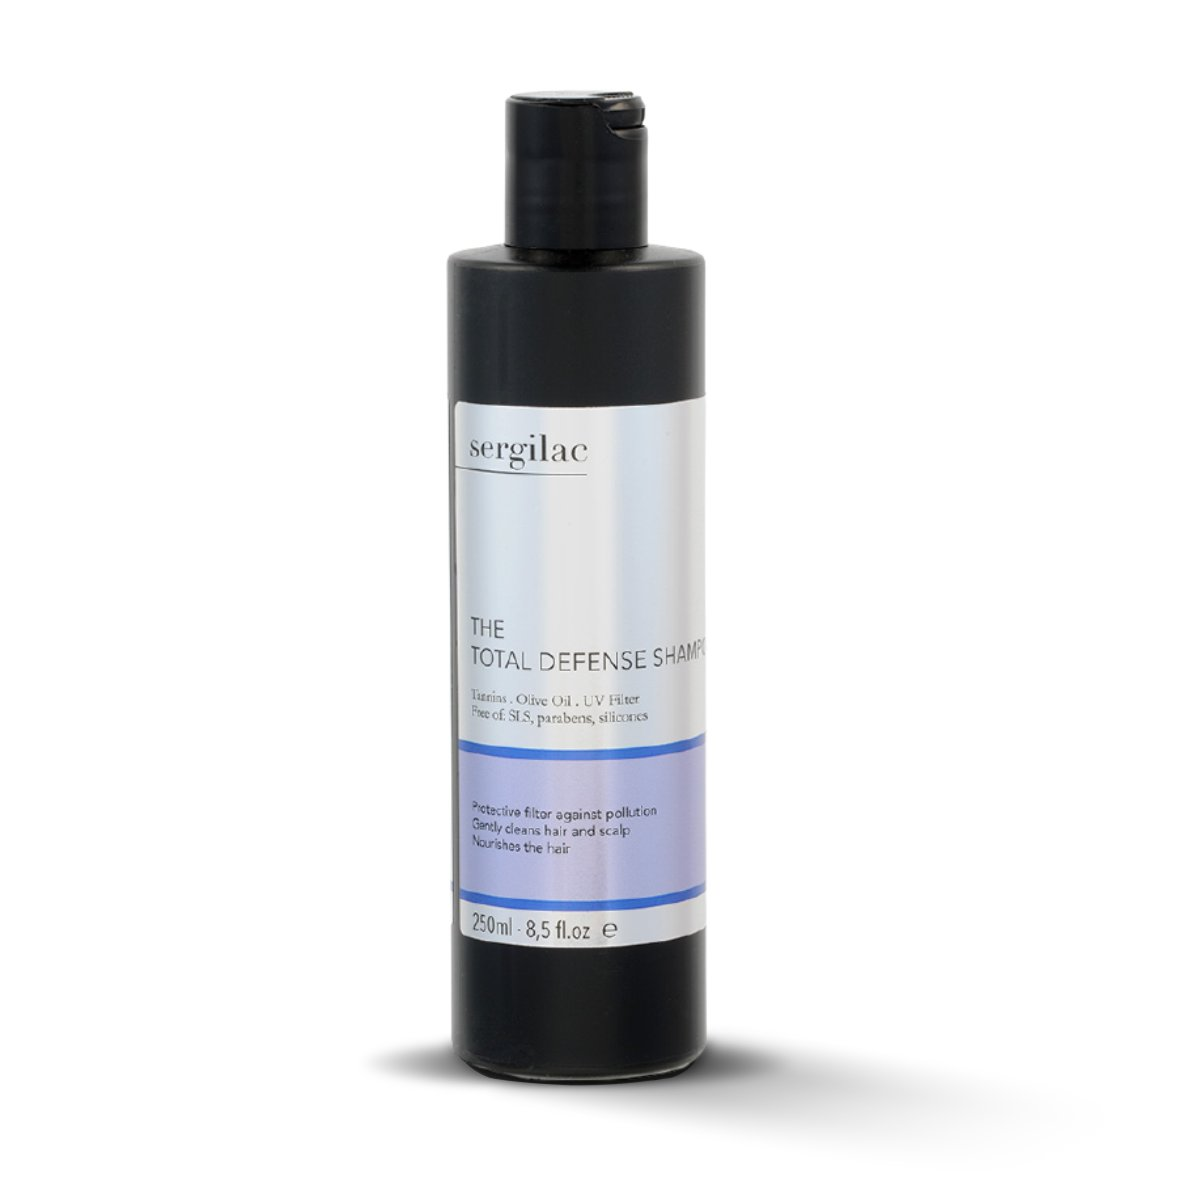 The Total Defense Shampoo - Sergilac 250ml